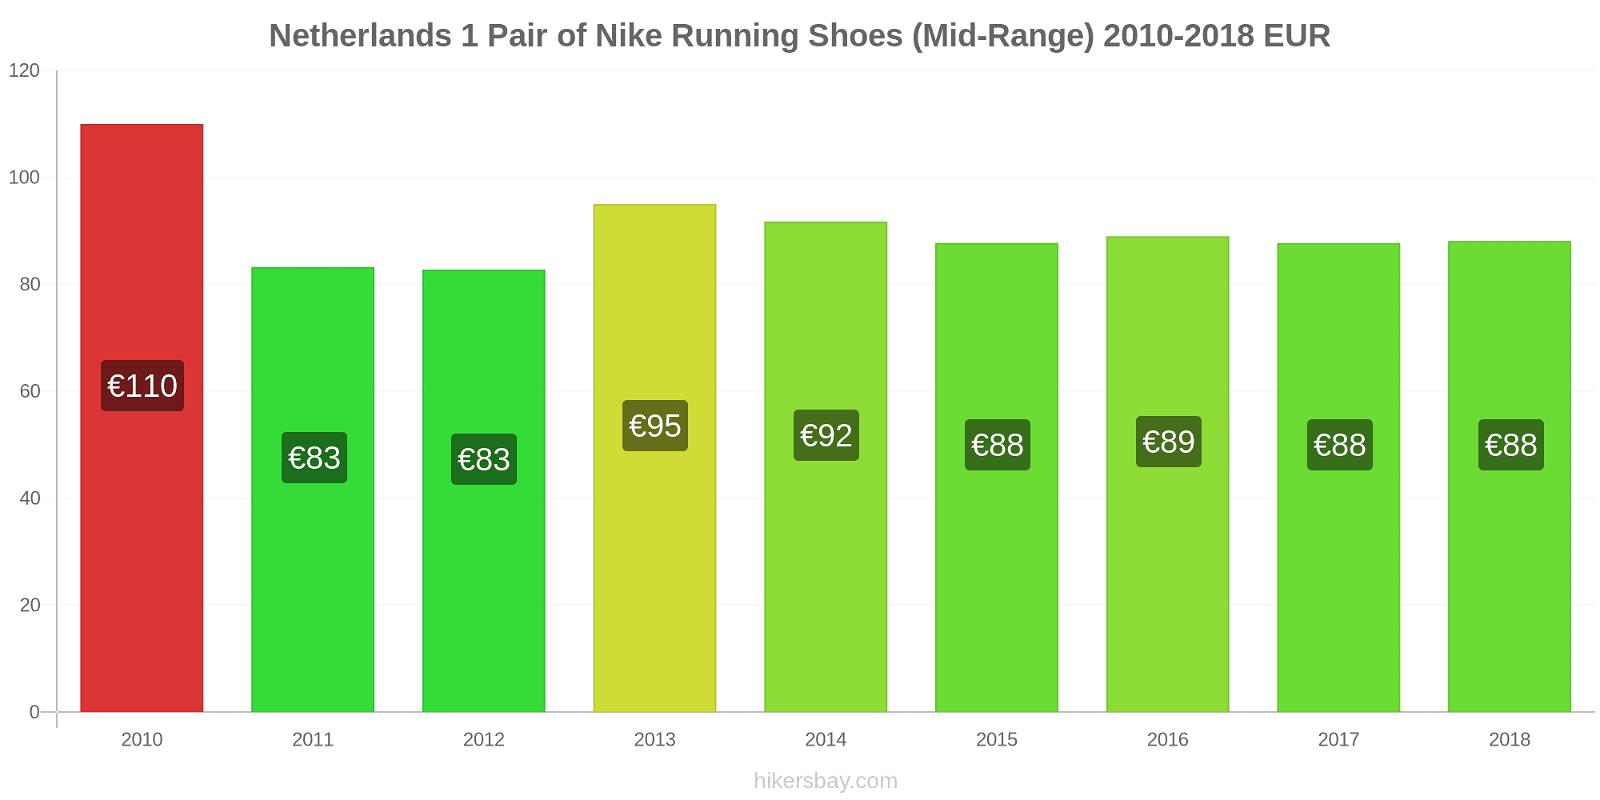 Netherlands price changes 1 Pair of Nike Running Shoes (Mid-Range) hikersbay.com